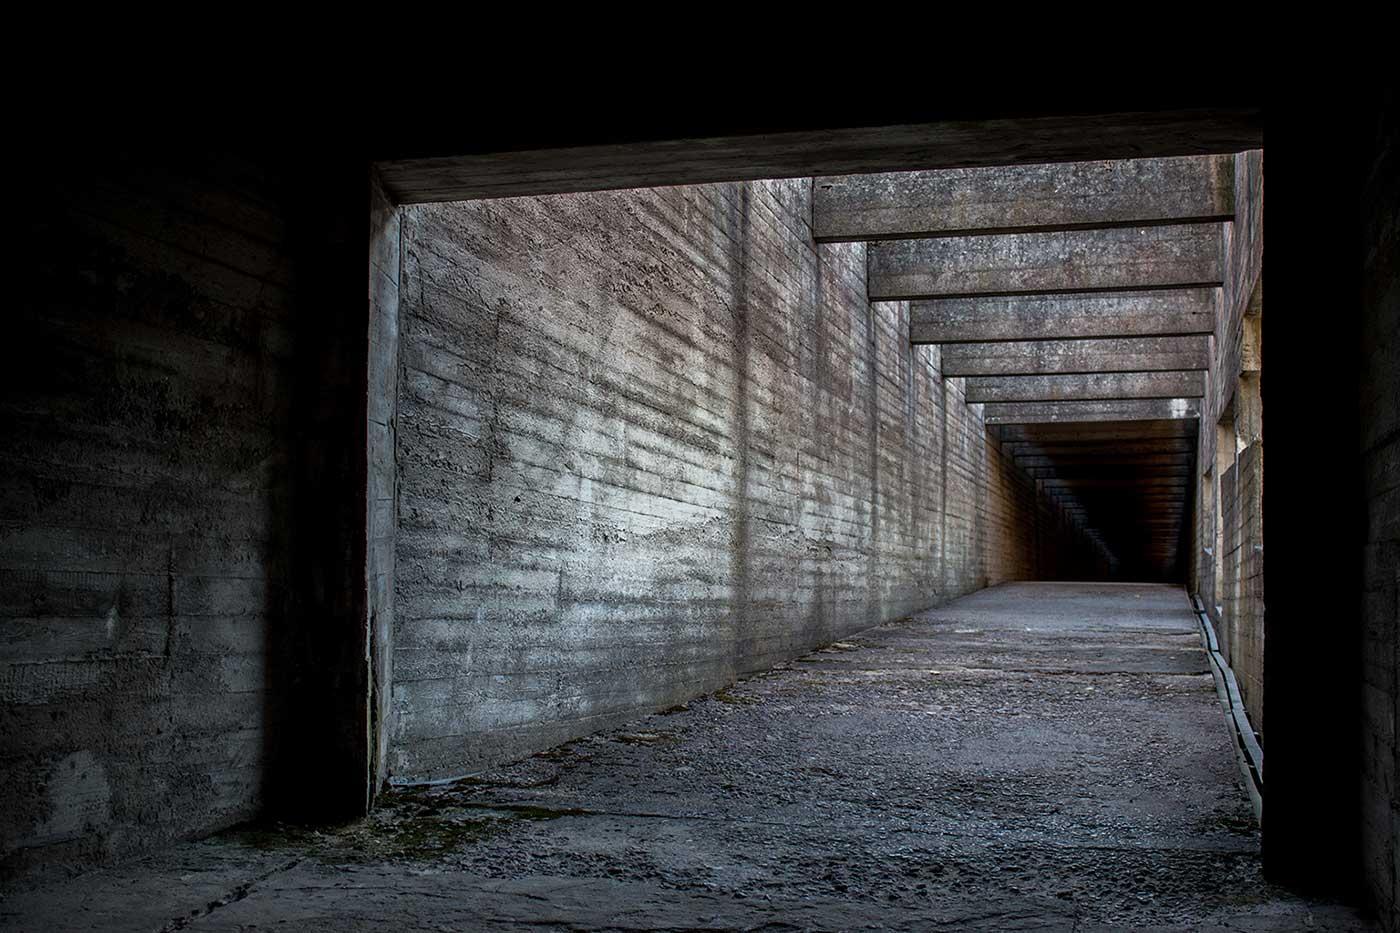 The walkway through the Brutalist gallery building. Salaspils Memorial, Latvia.